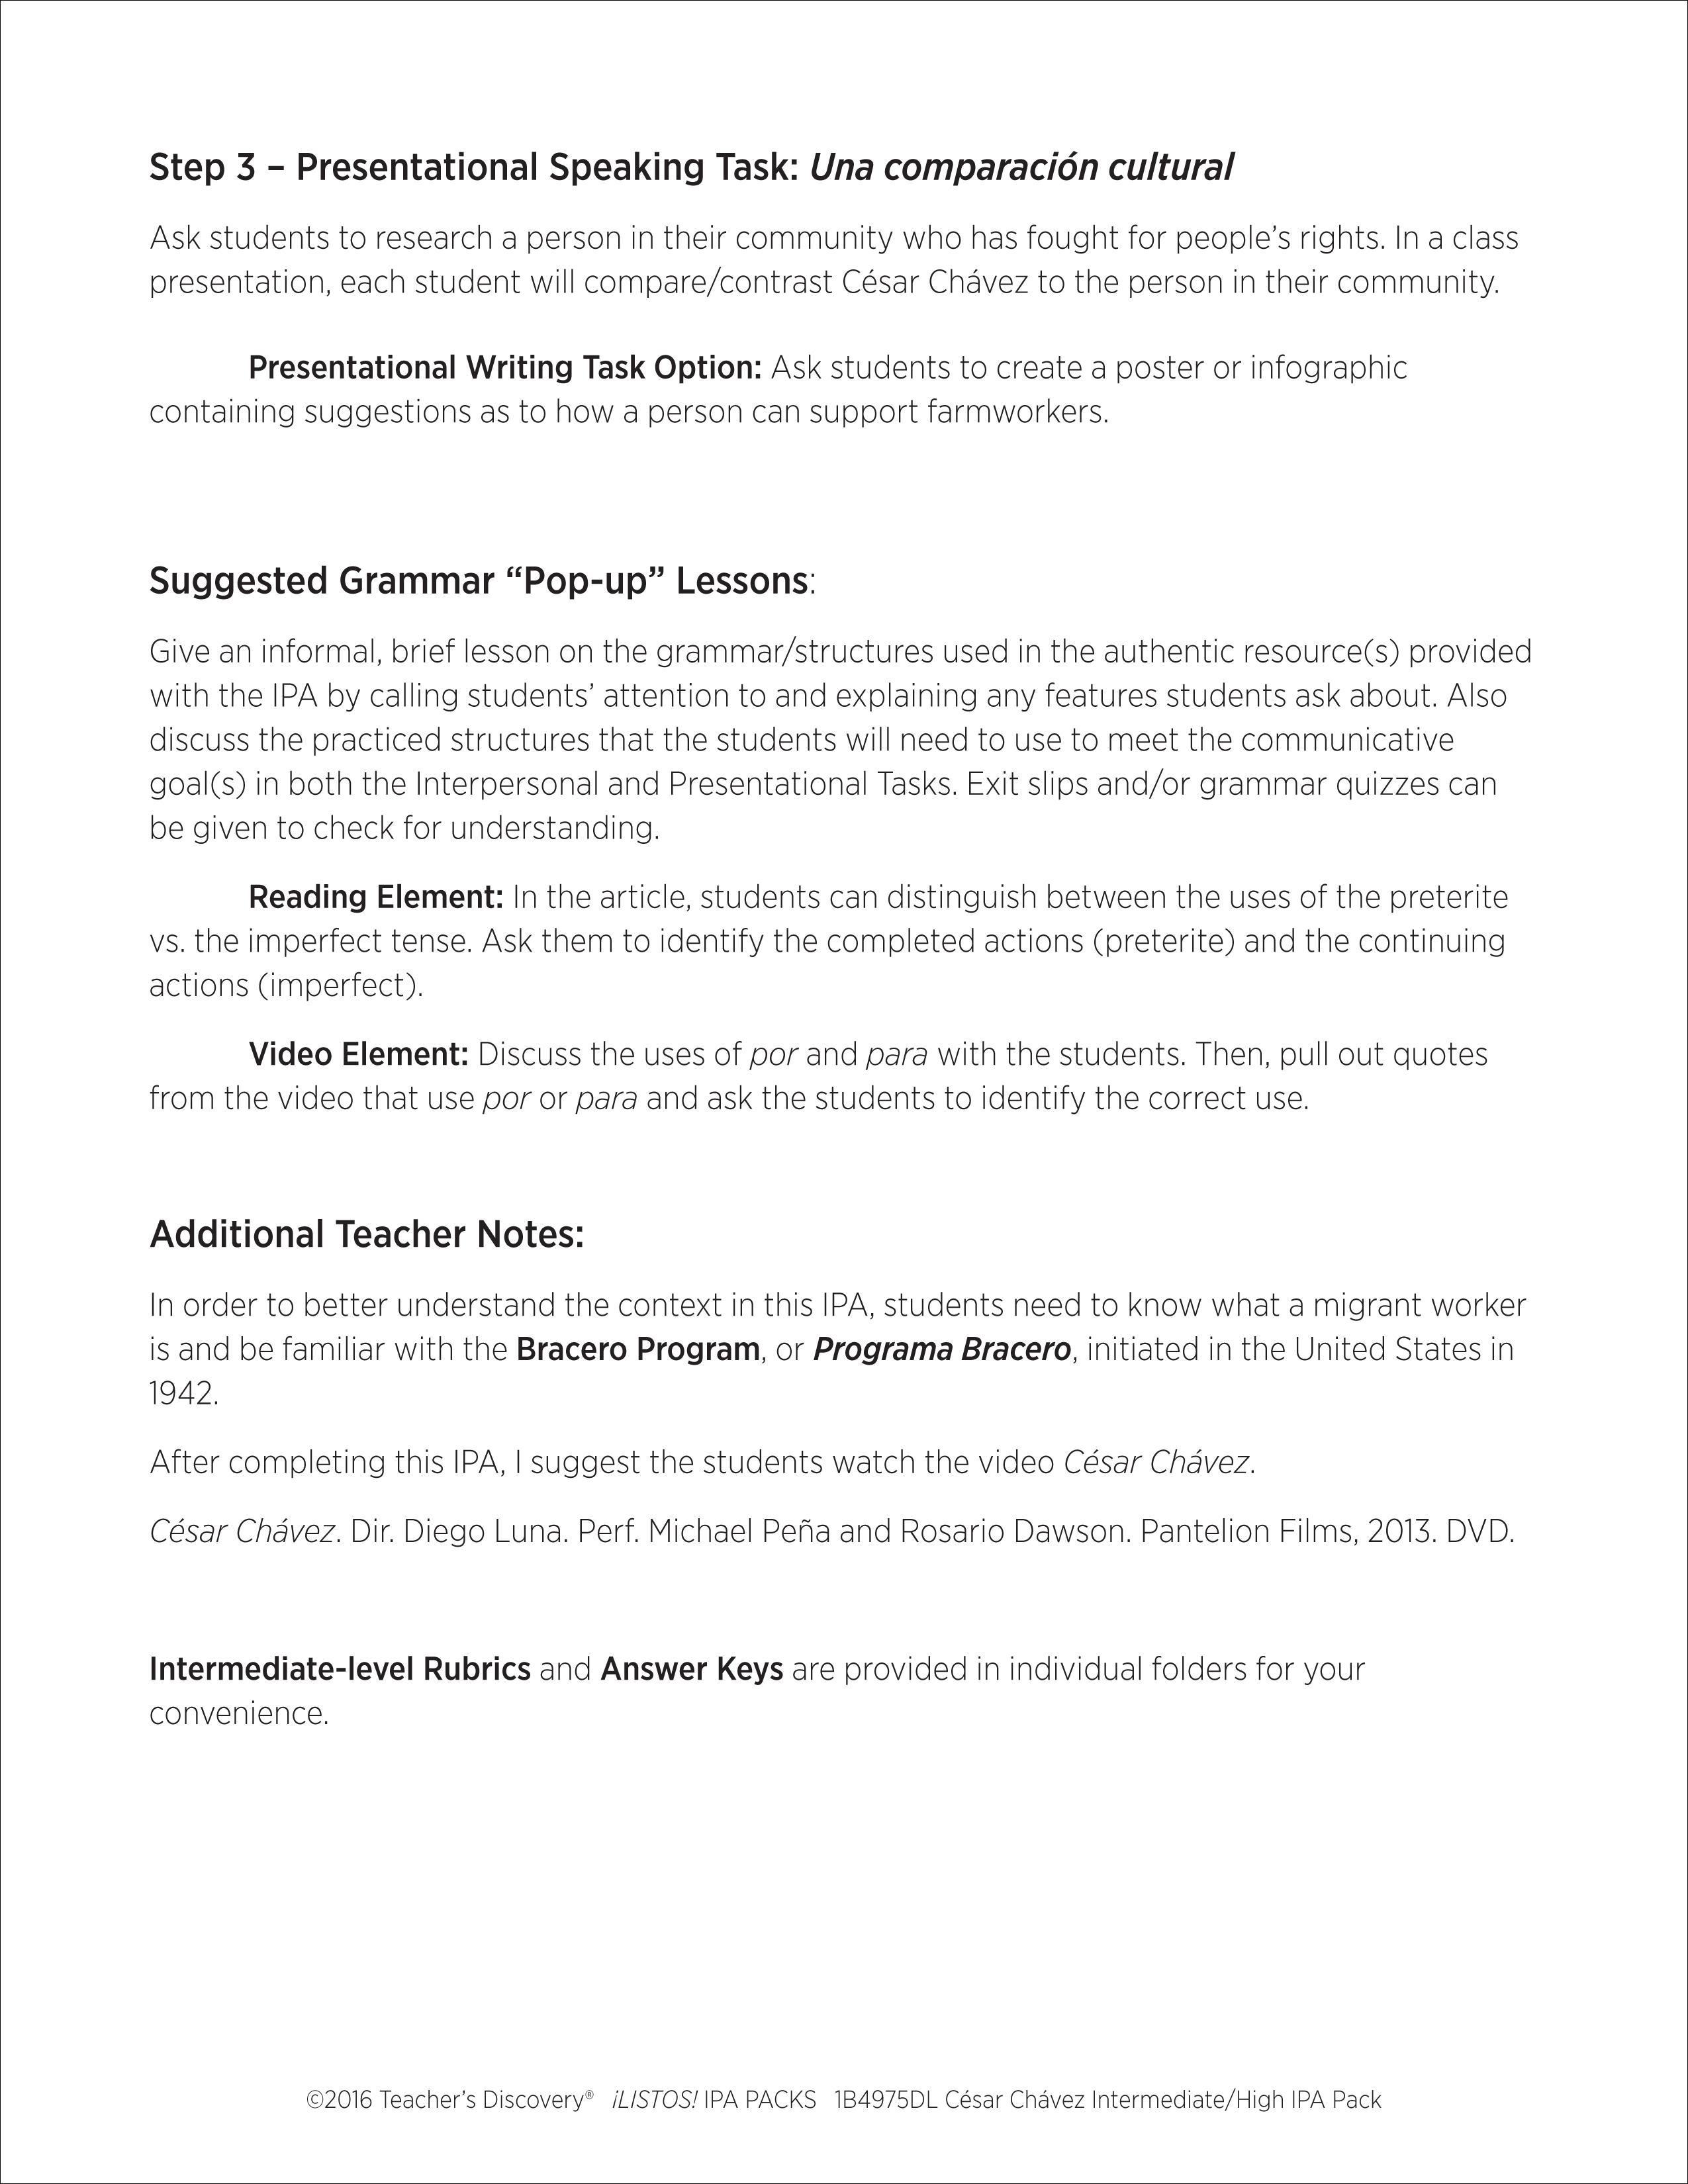 Worksheets Preterite Vs Imperfect Worksheet cesar chavez intermediate high spanish ipa pack download enlarge image